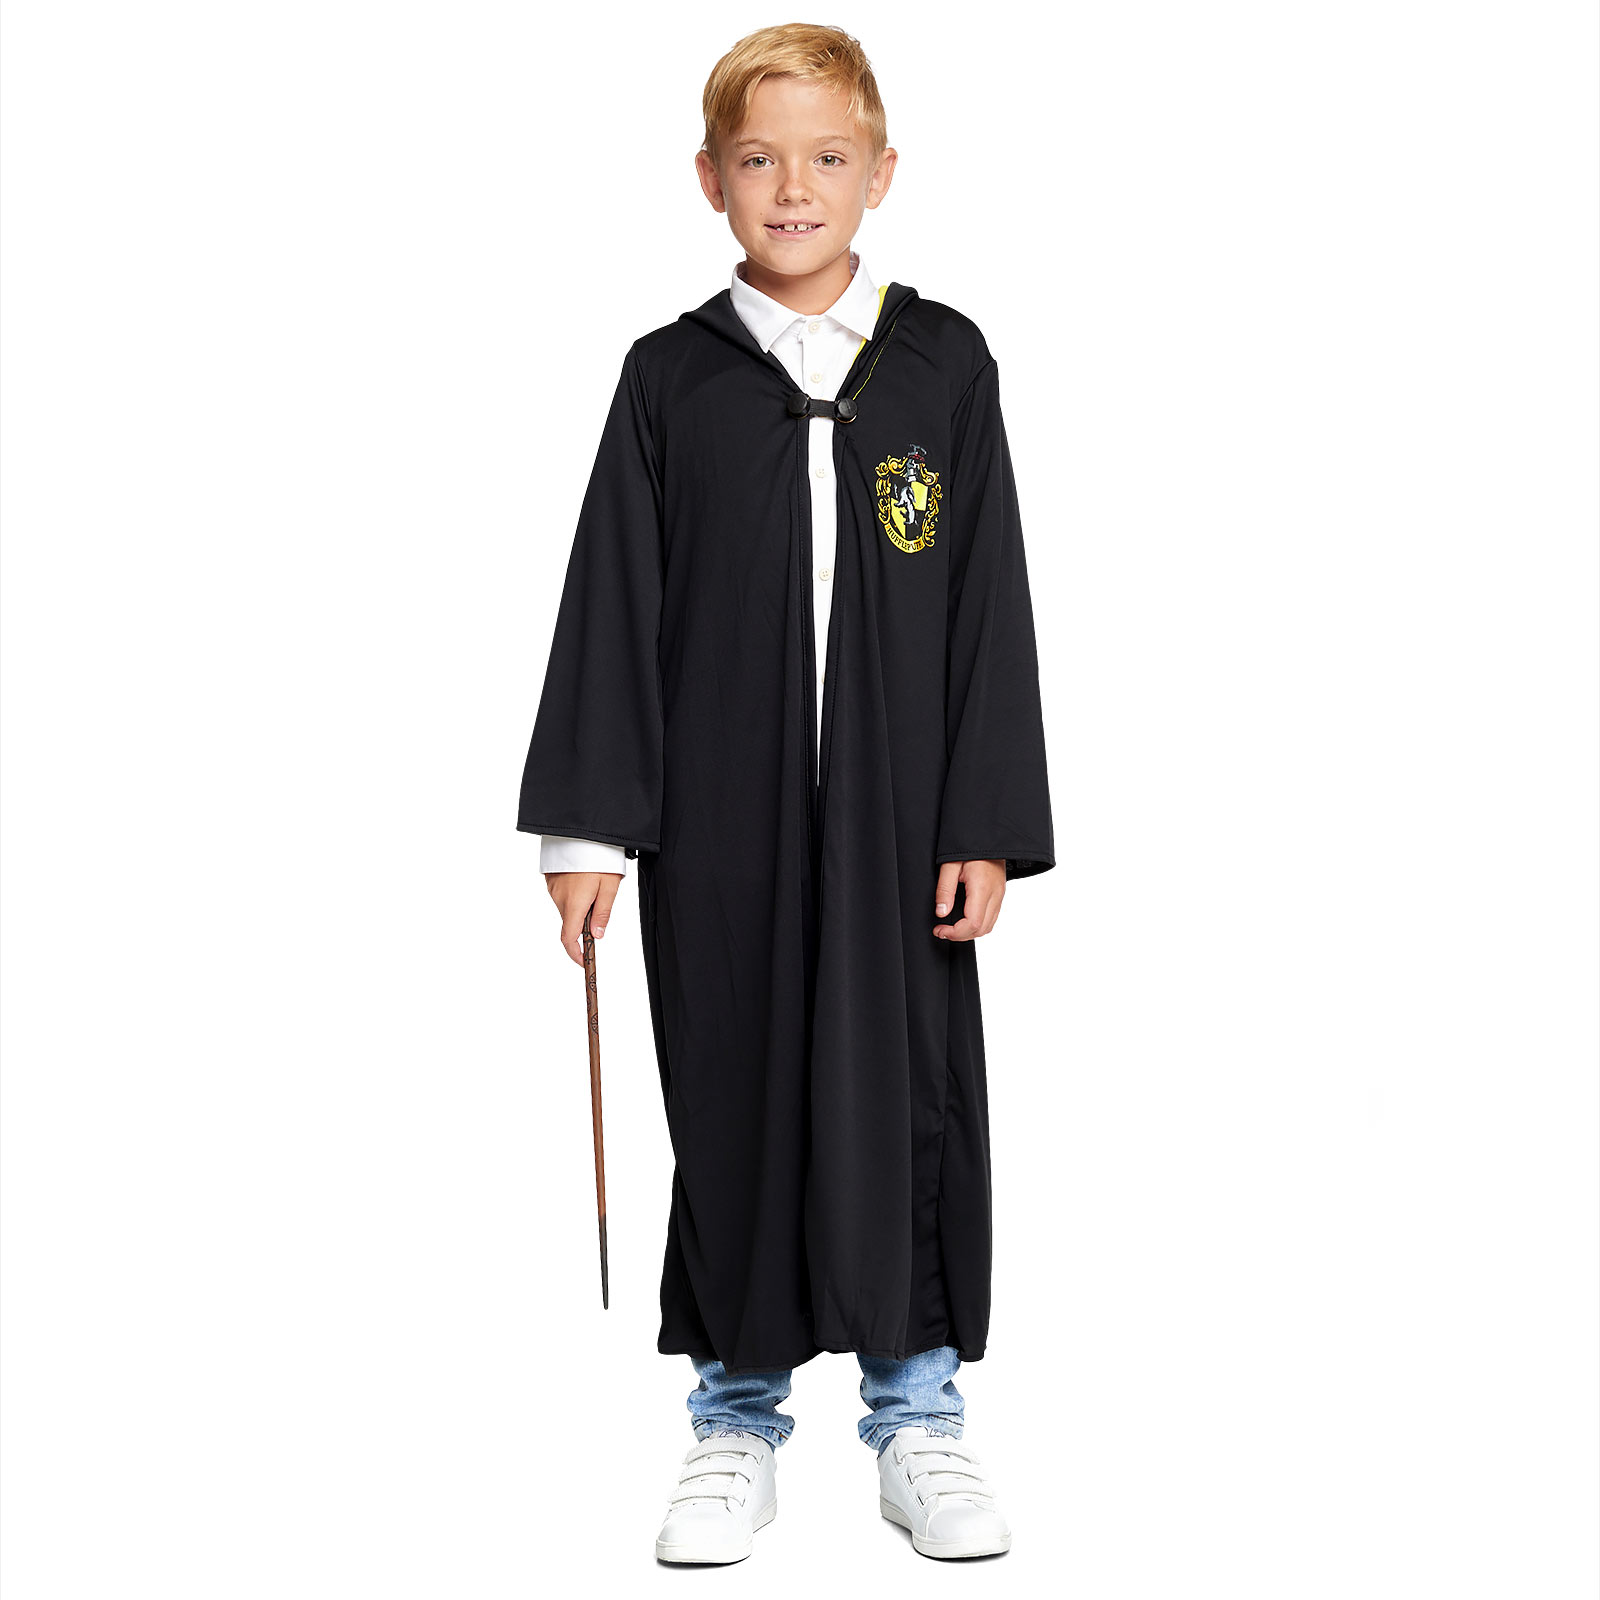 Harry Potter - Hufflepuff Robe für Kinder